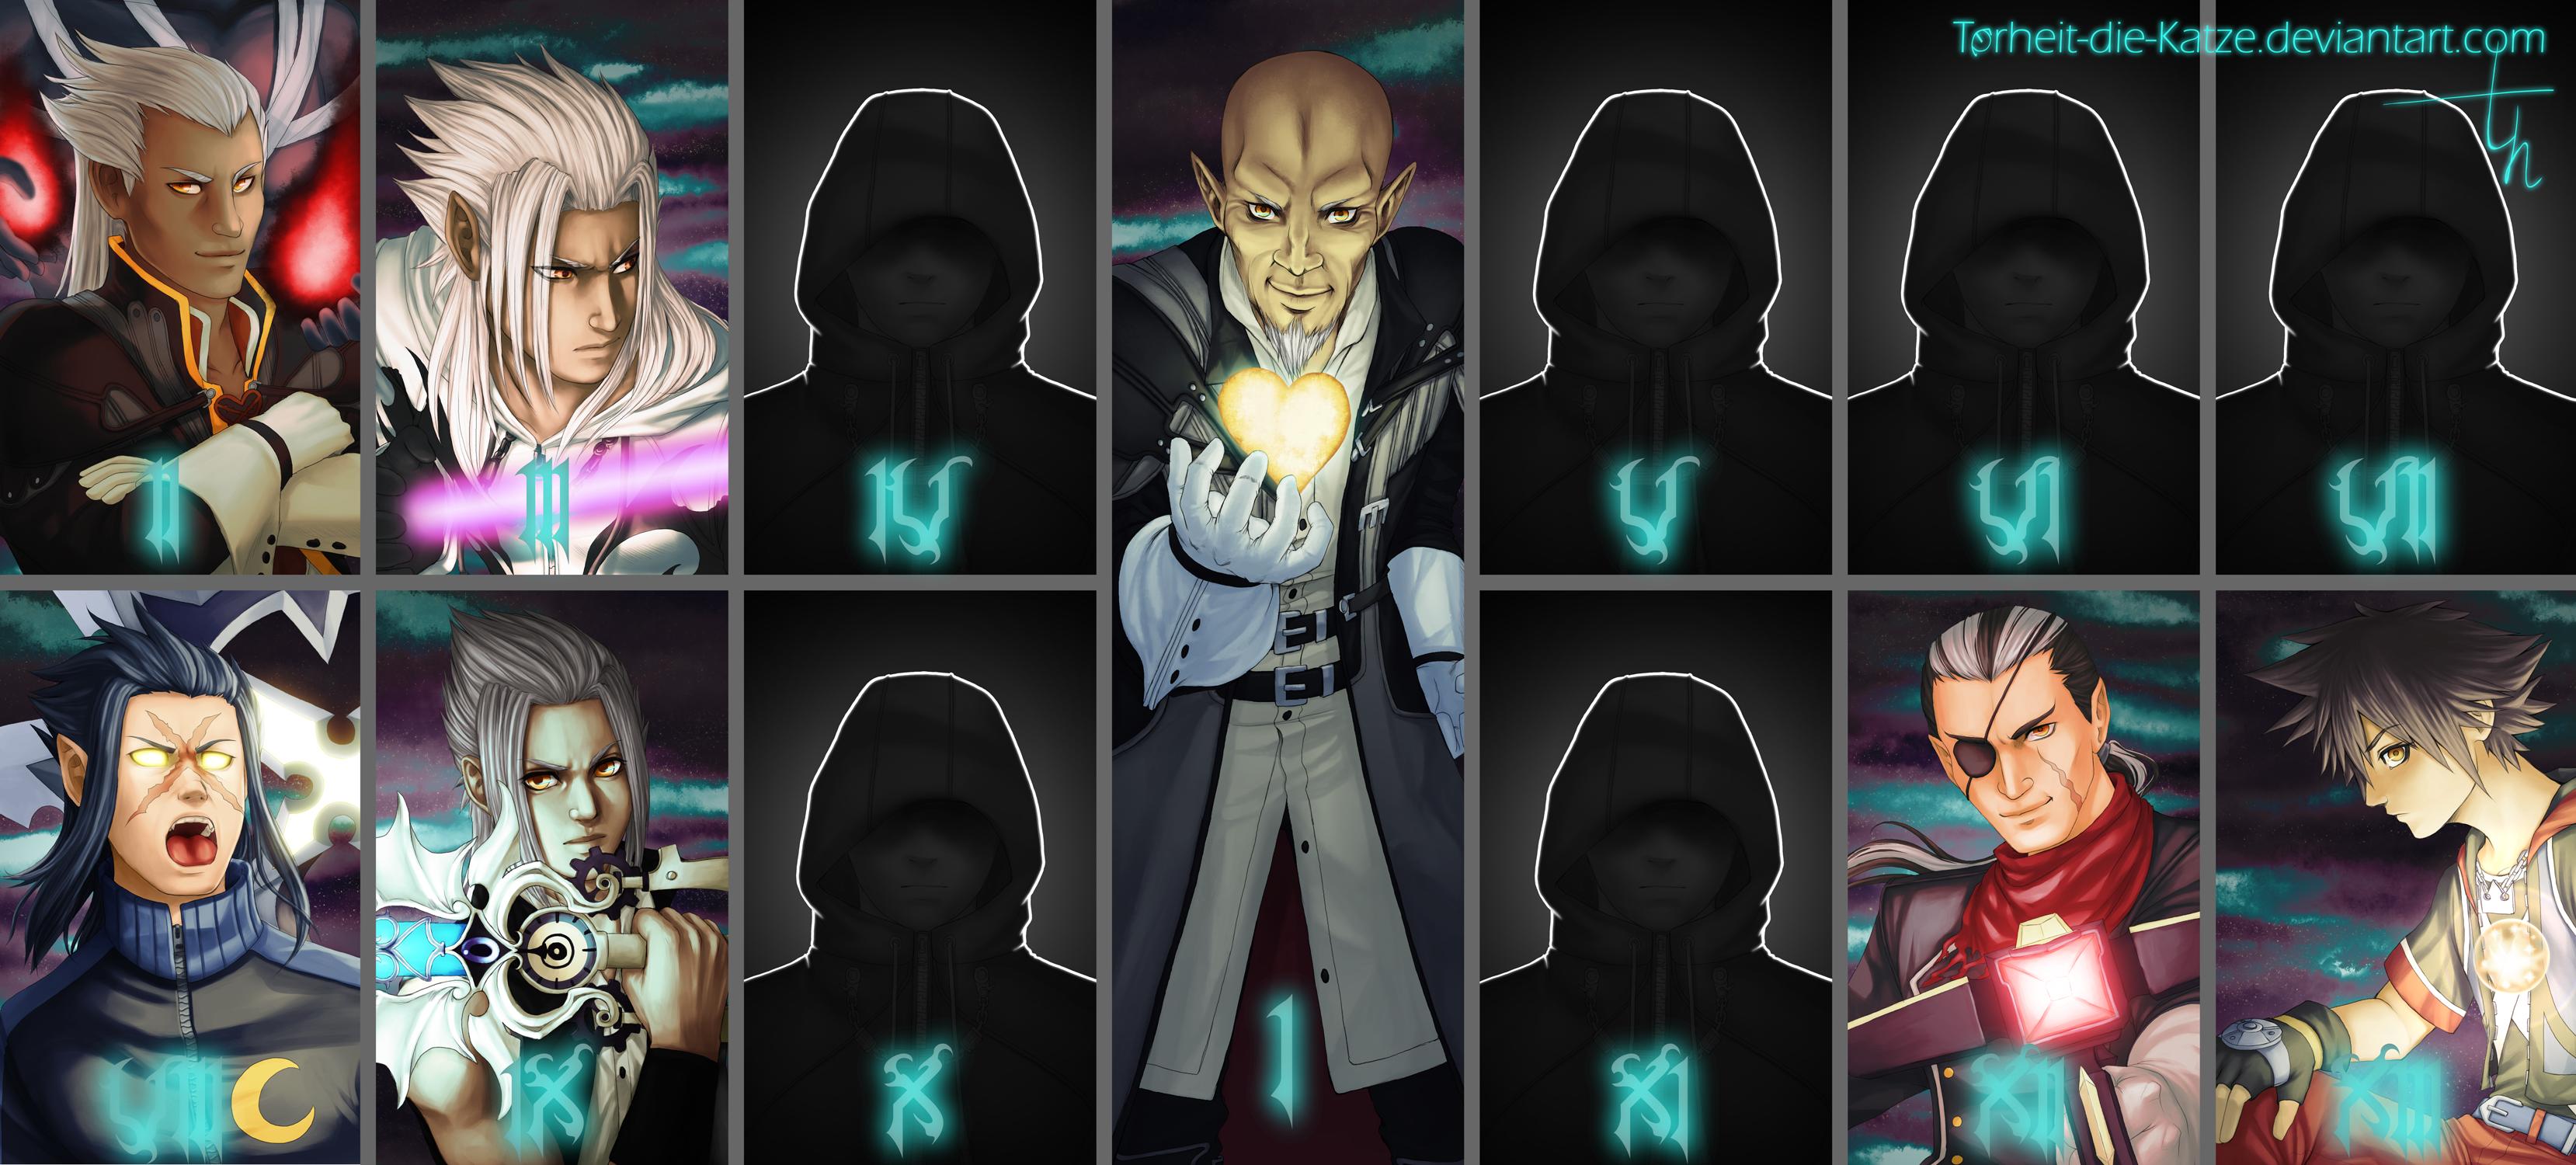 KH - The new Organization XIII by Torheit-Skadi